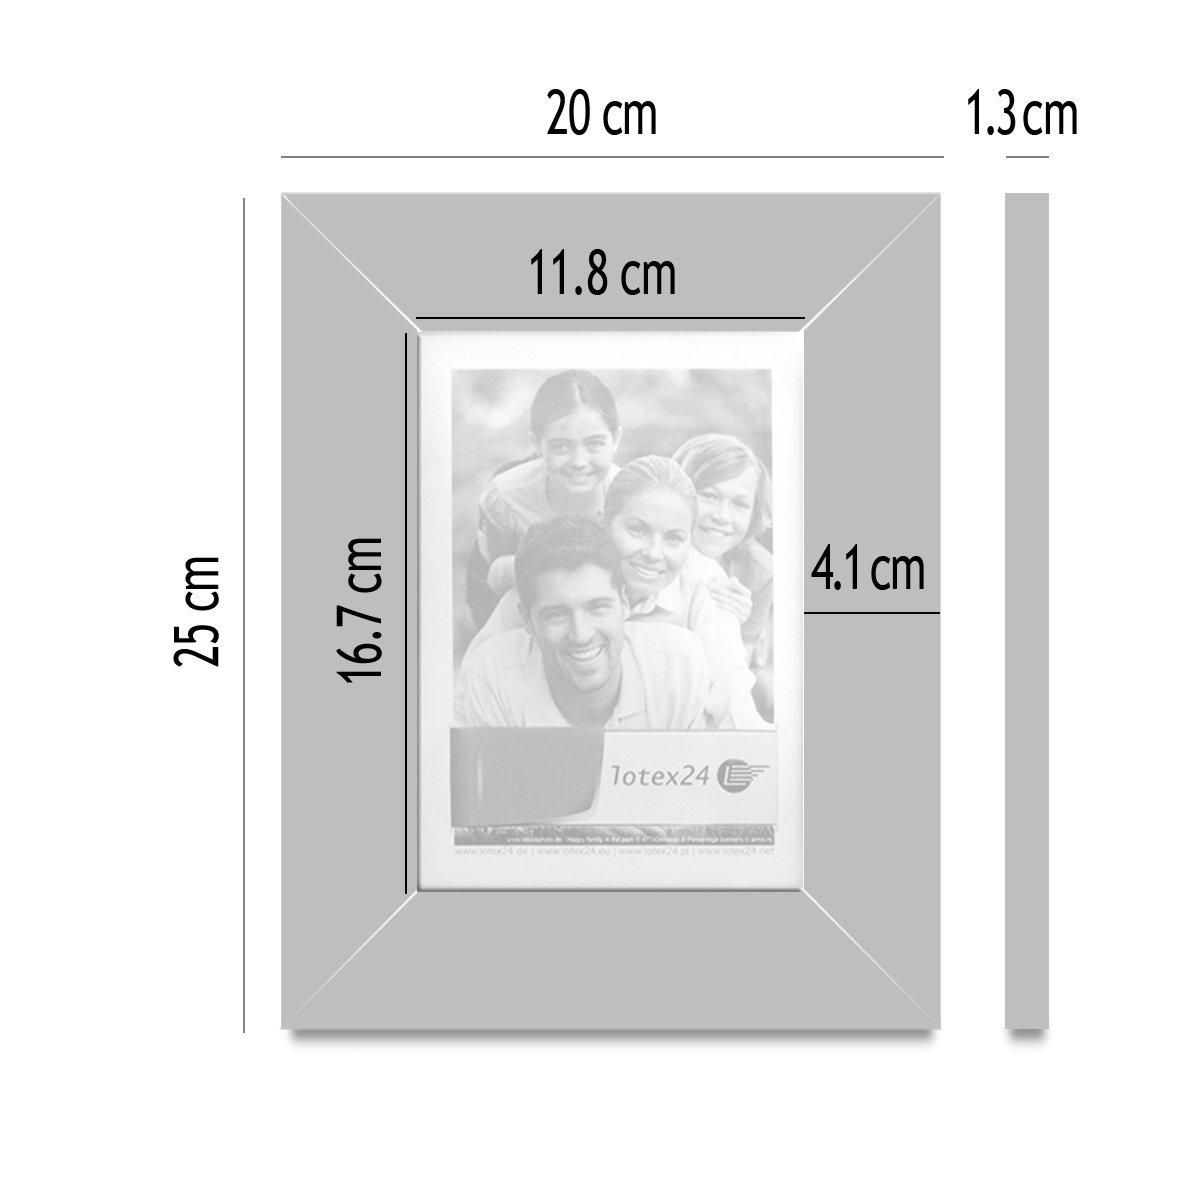 Bilderrahmen 20 x 25 cm Türkis blau Rahmen für Bildformat 13 x 18 cm ...